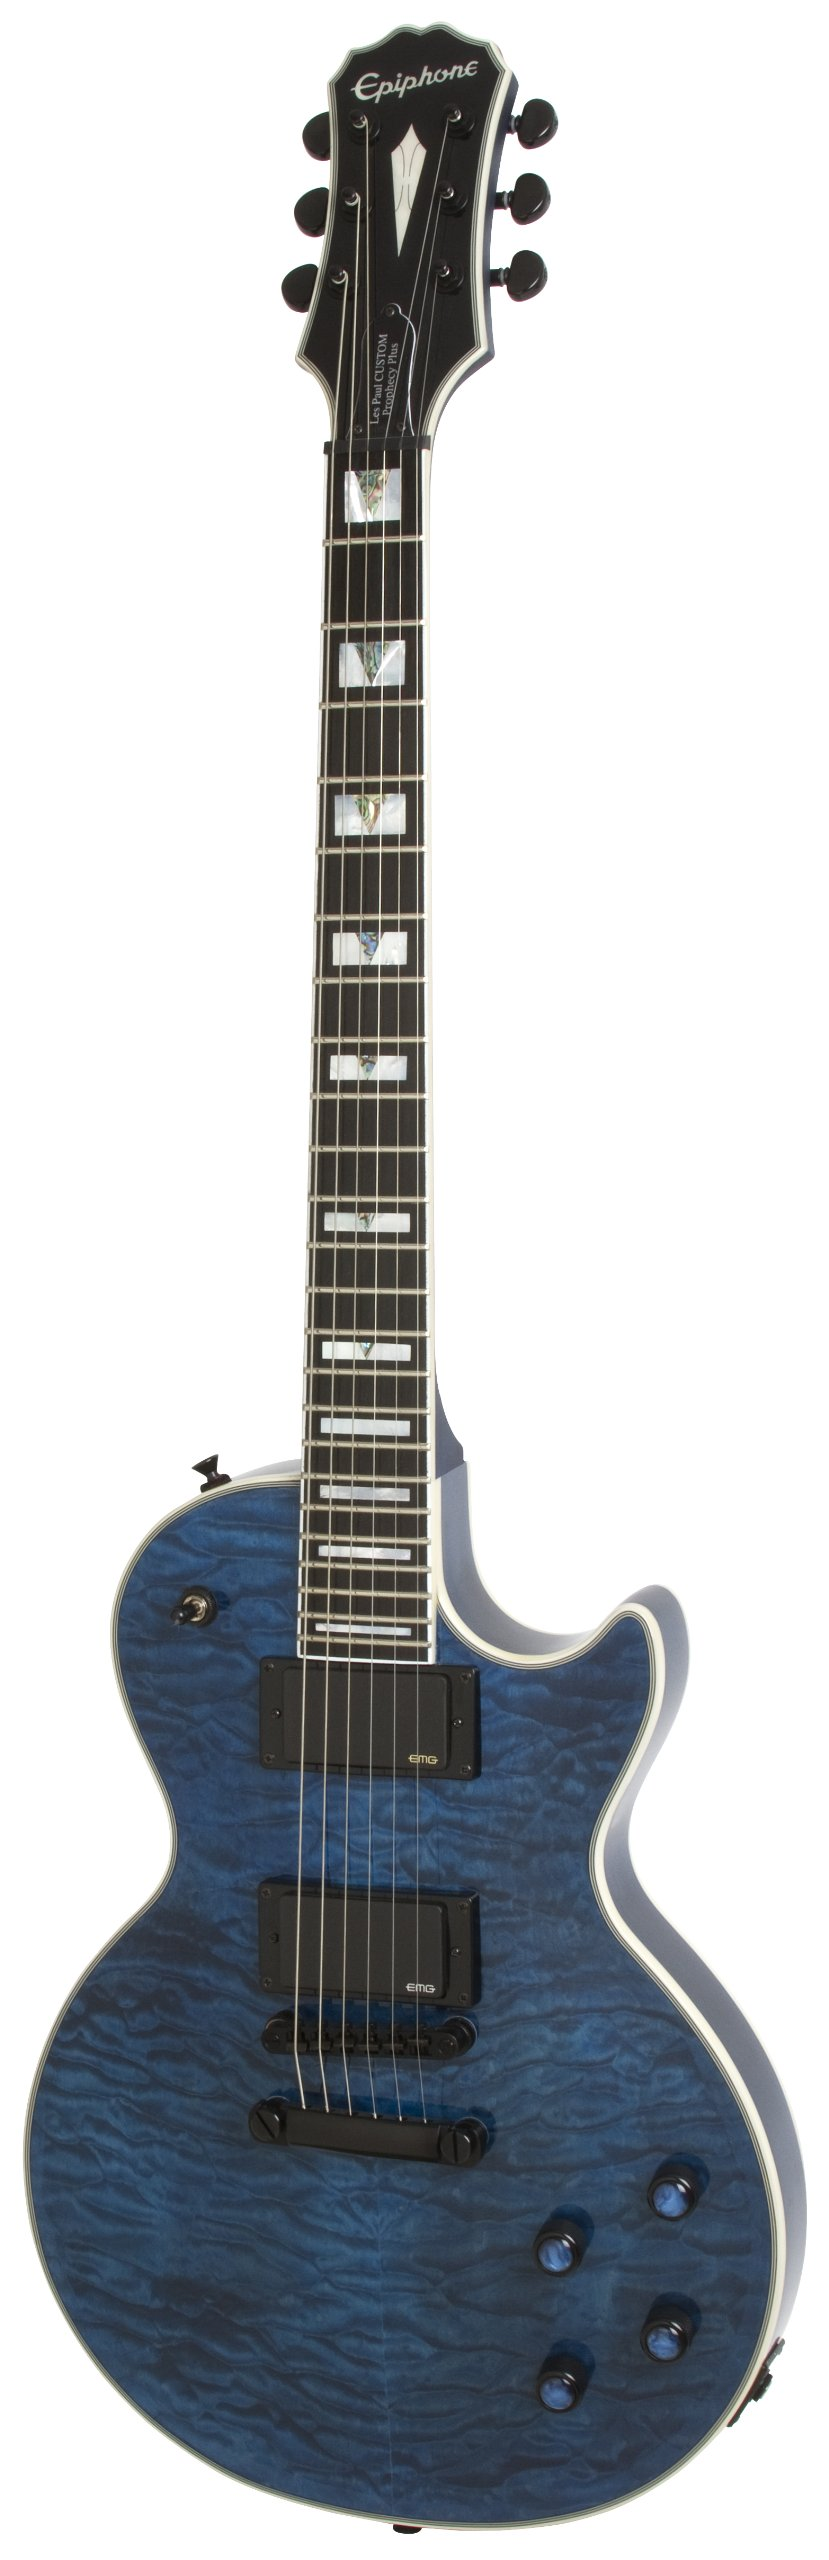 Epiphone Prophecy Les Paul Custom Plus EX Outfit - Guitarra eléctrica, color midnight sapphire: Amazon.es: Instrumentos musicales